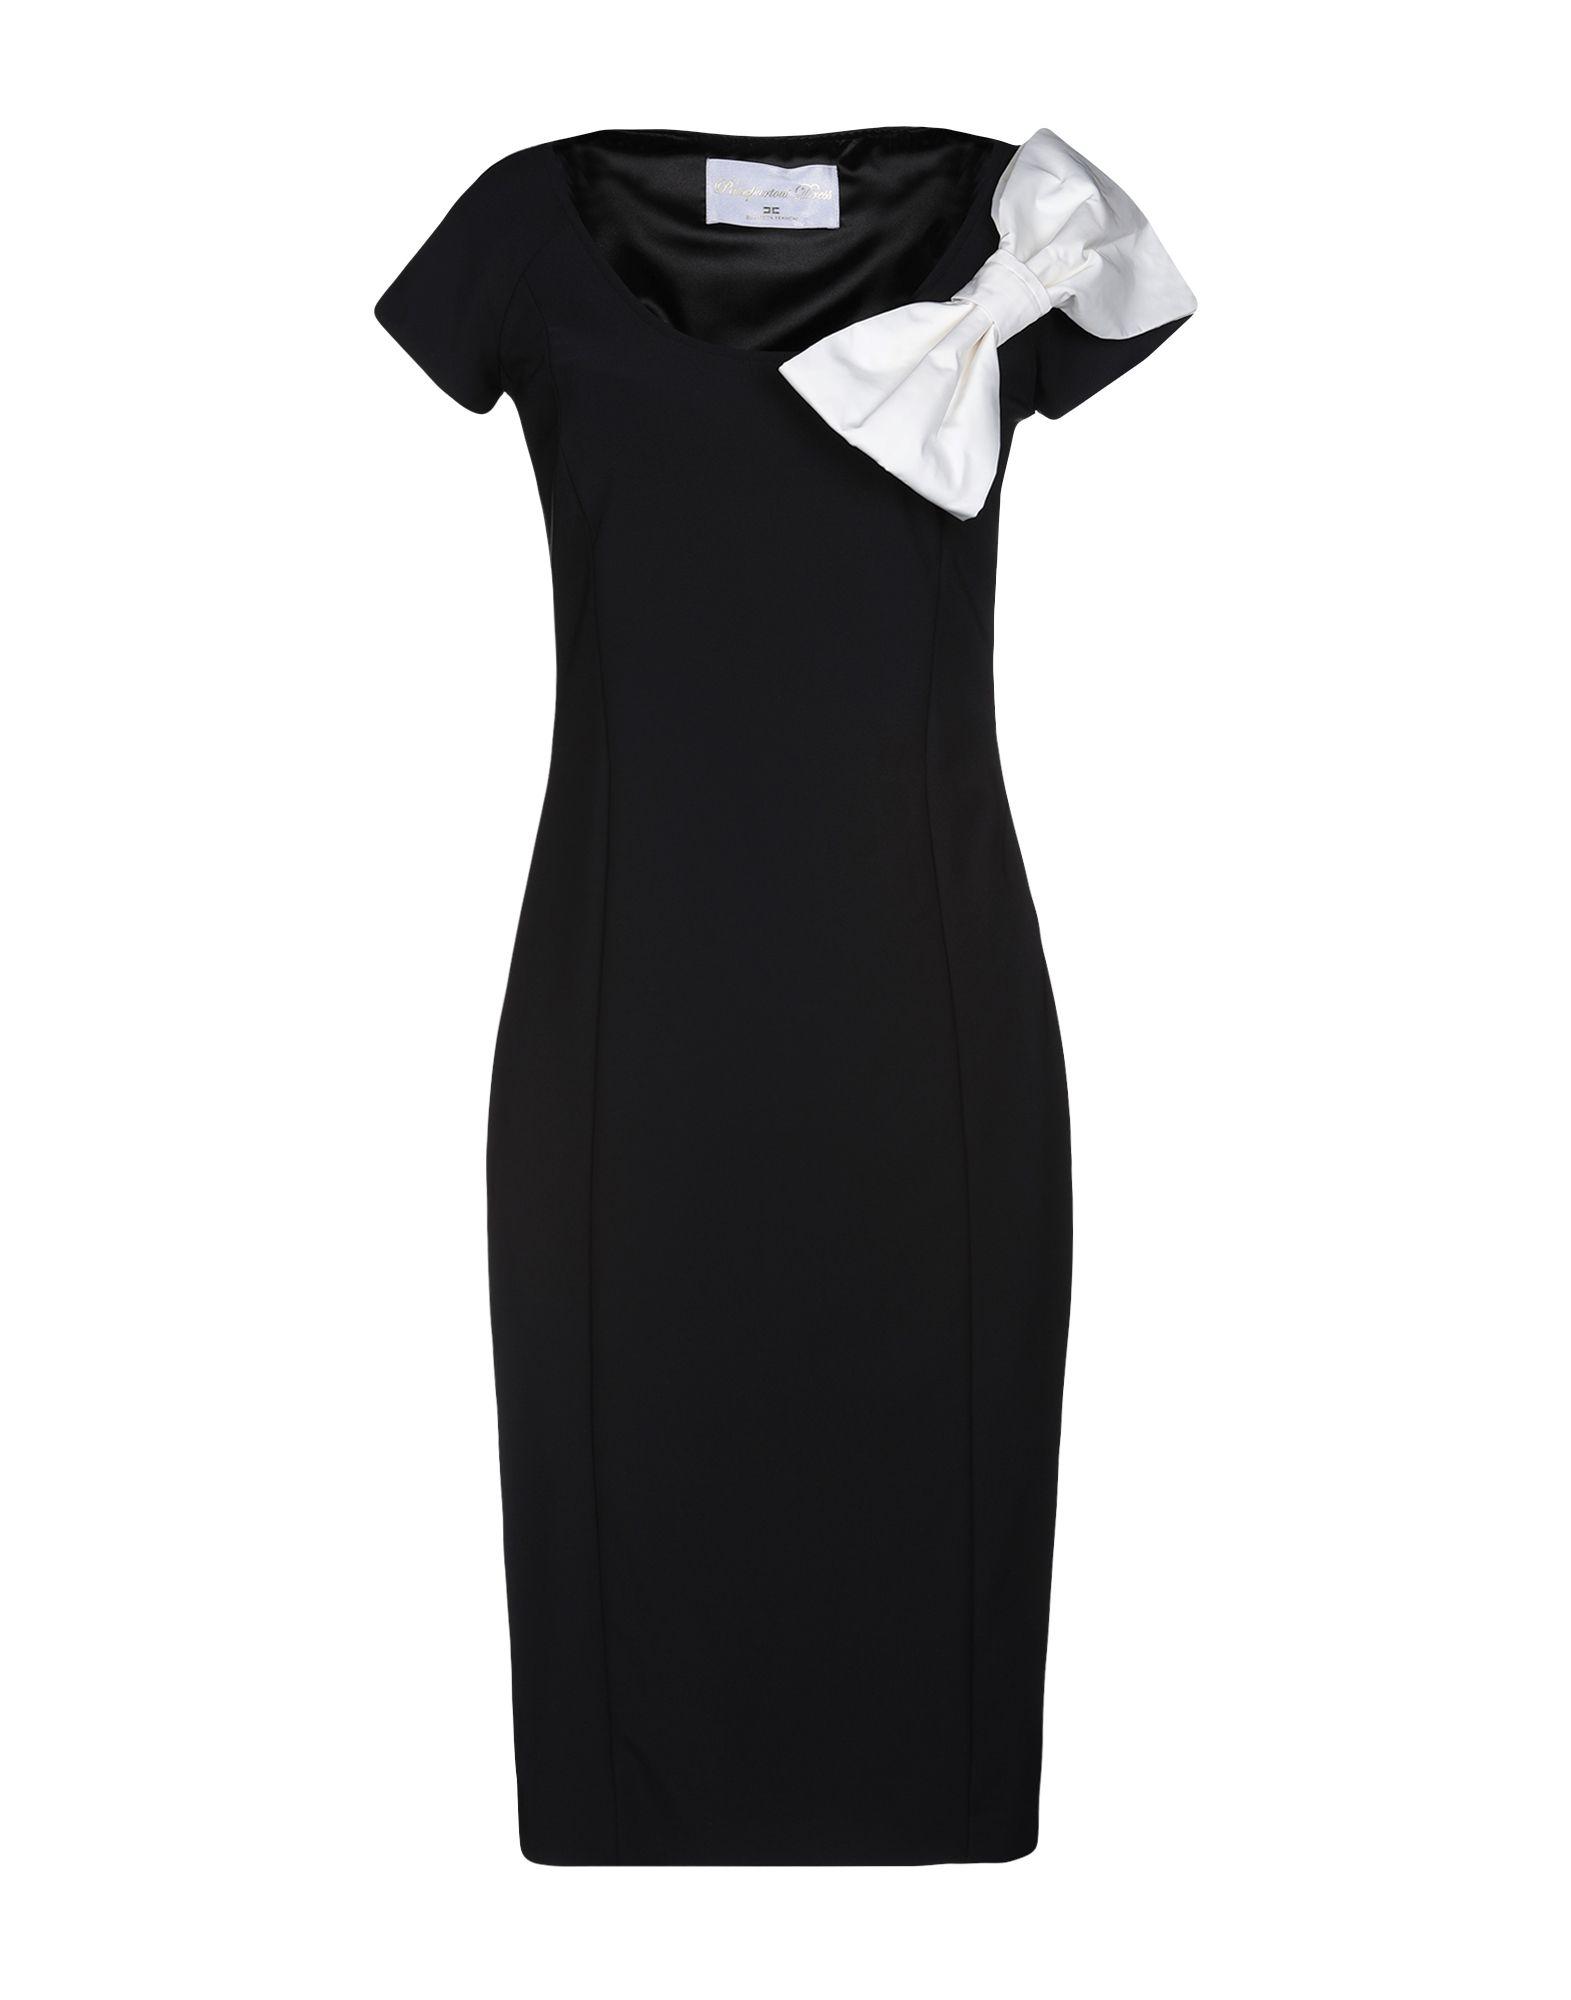 PASSEPARTOUT DRESS by ELISABETTA FRANCHI CELYN b. Платье до колена платье quelle b c best connections by heine 74359 page 9